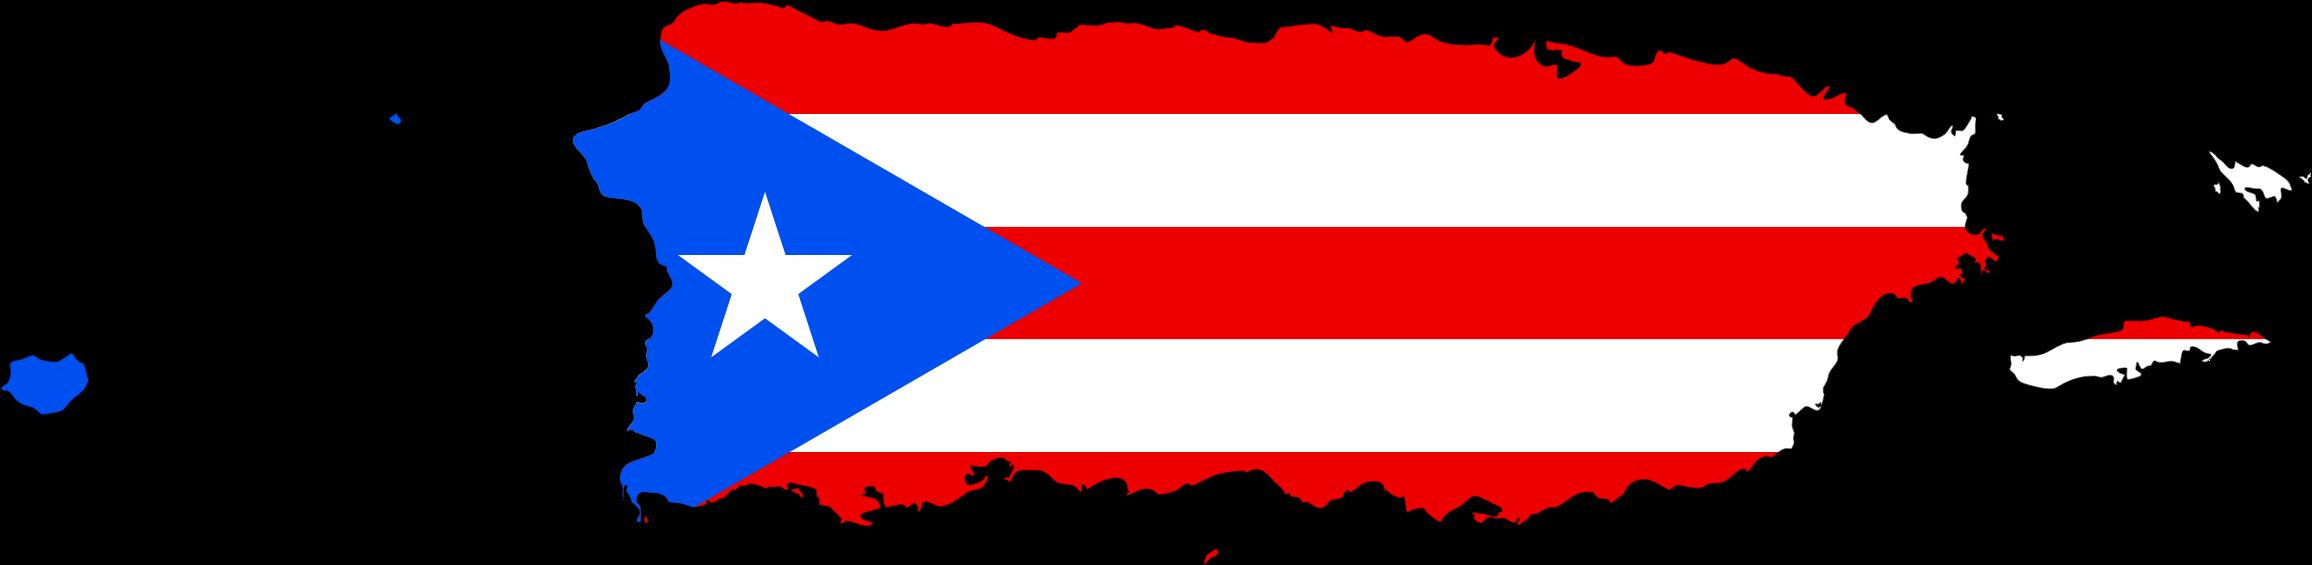 Mapa de puerto rico clipart transparent Collection of Puerto rico clipart | Free download best Puerto rico ... transparent